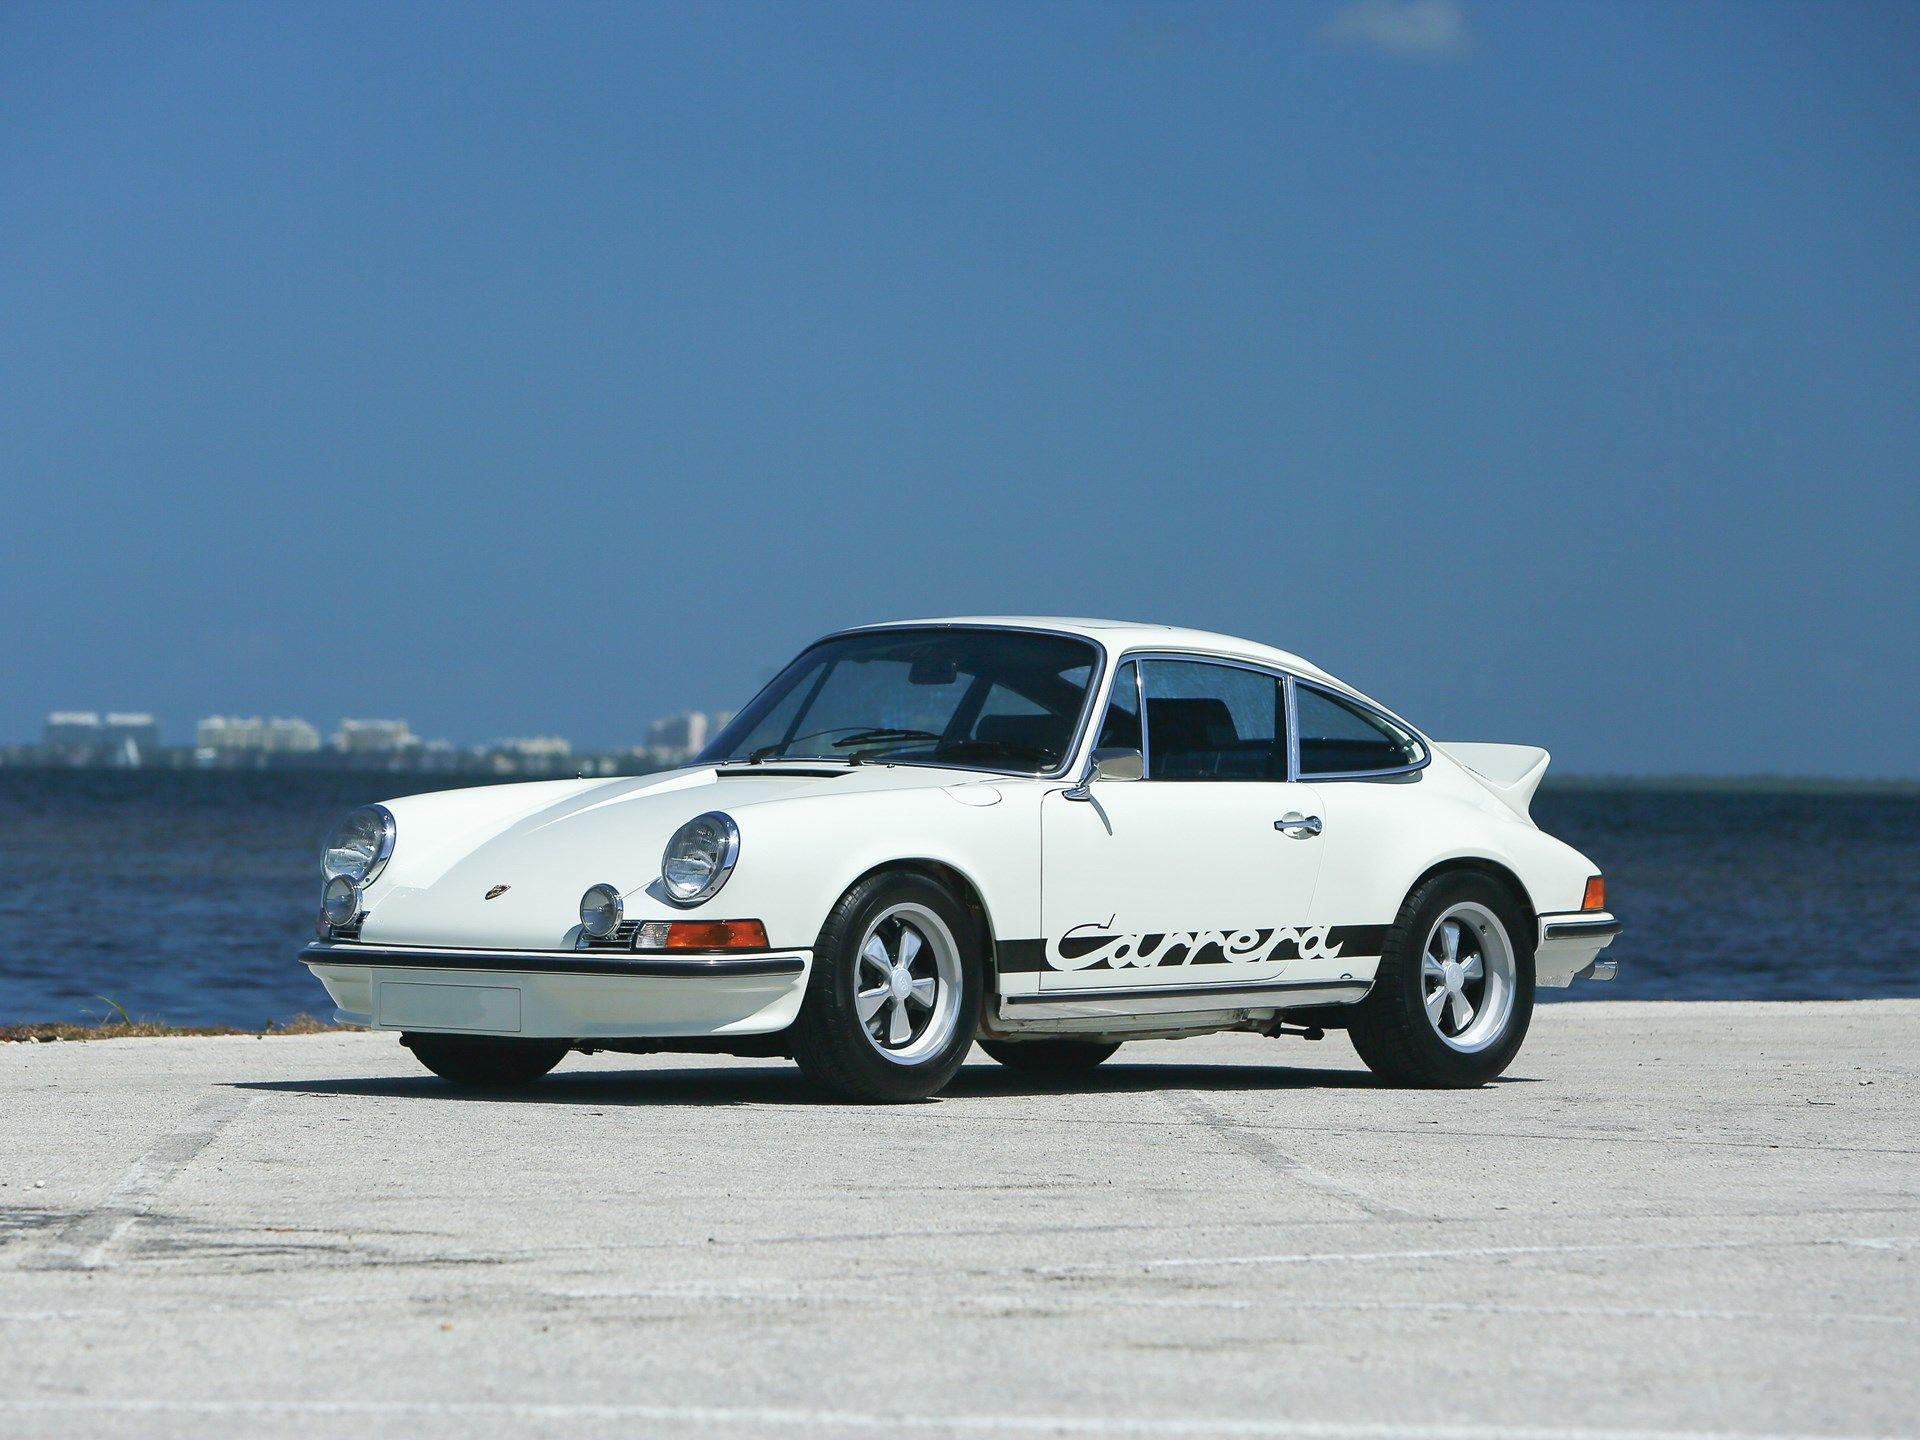 1973 Porsche 911 Carrera Rs 2 7 Touring Vin 9113601018 Classic Com